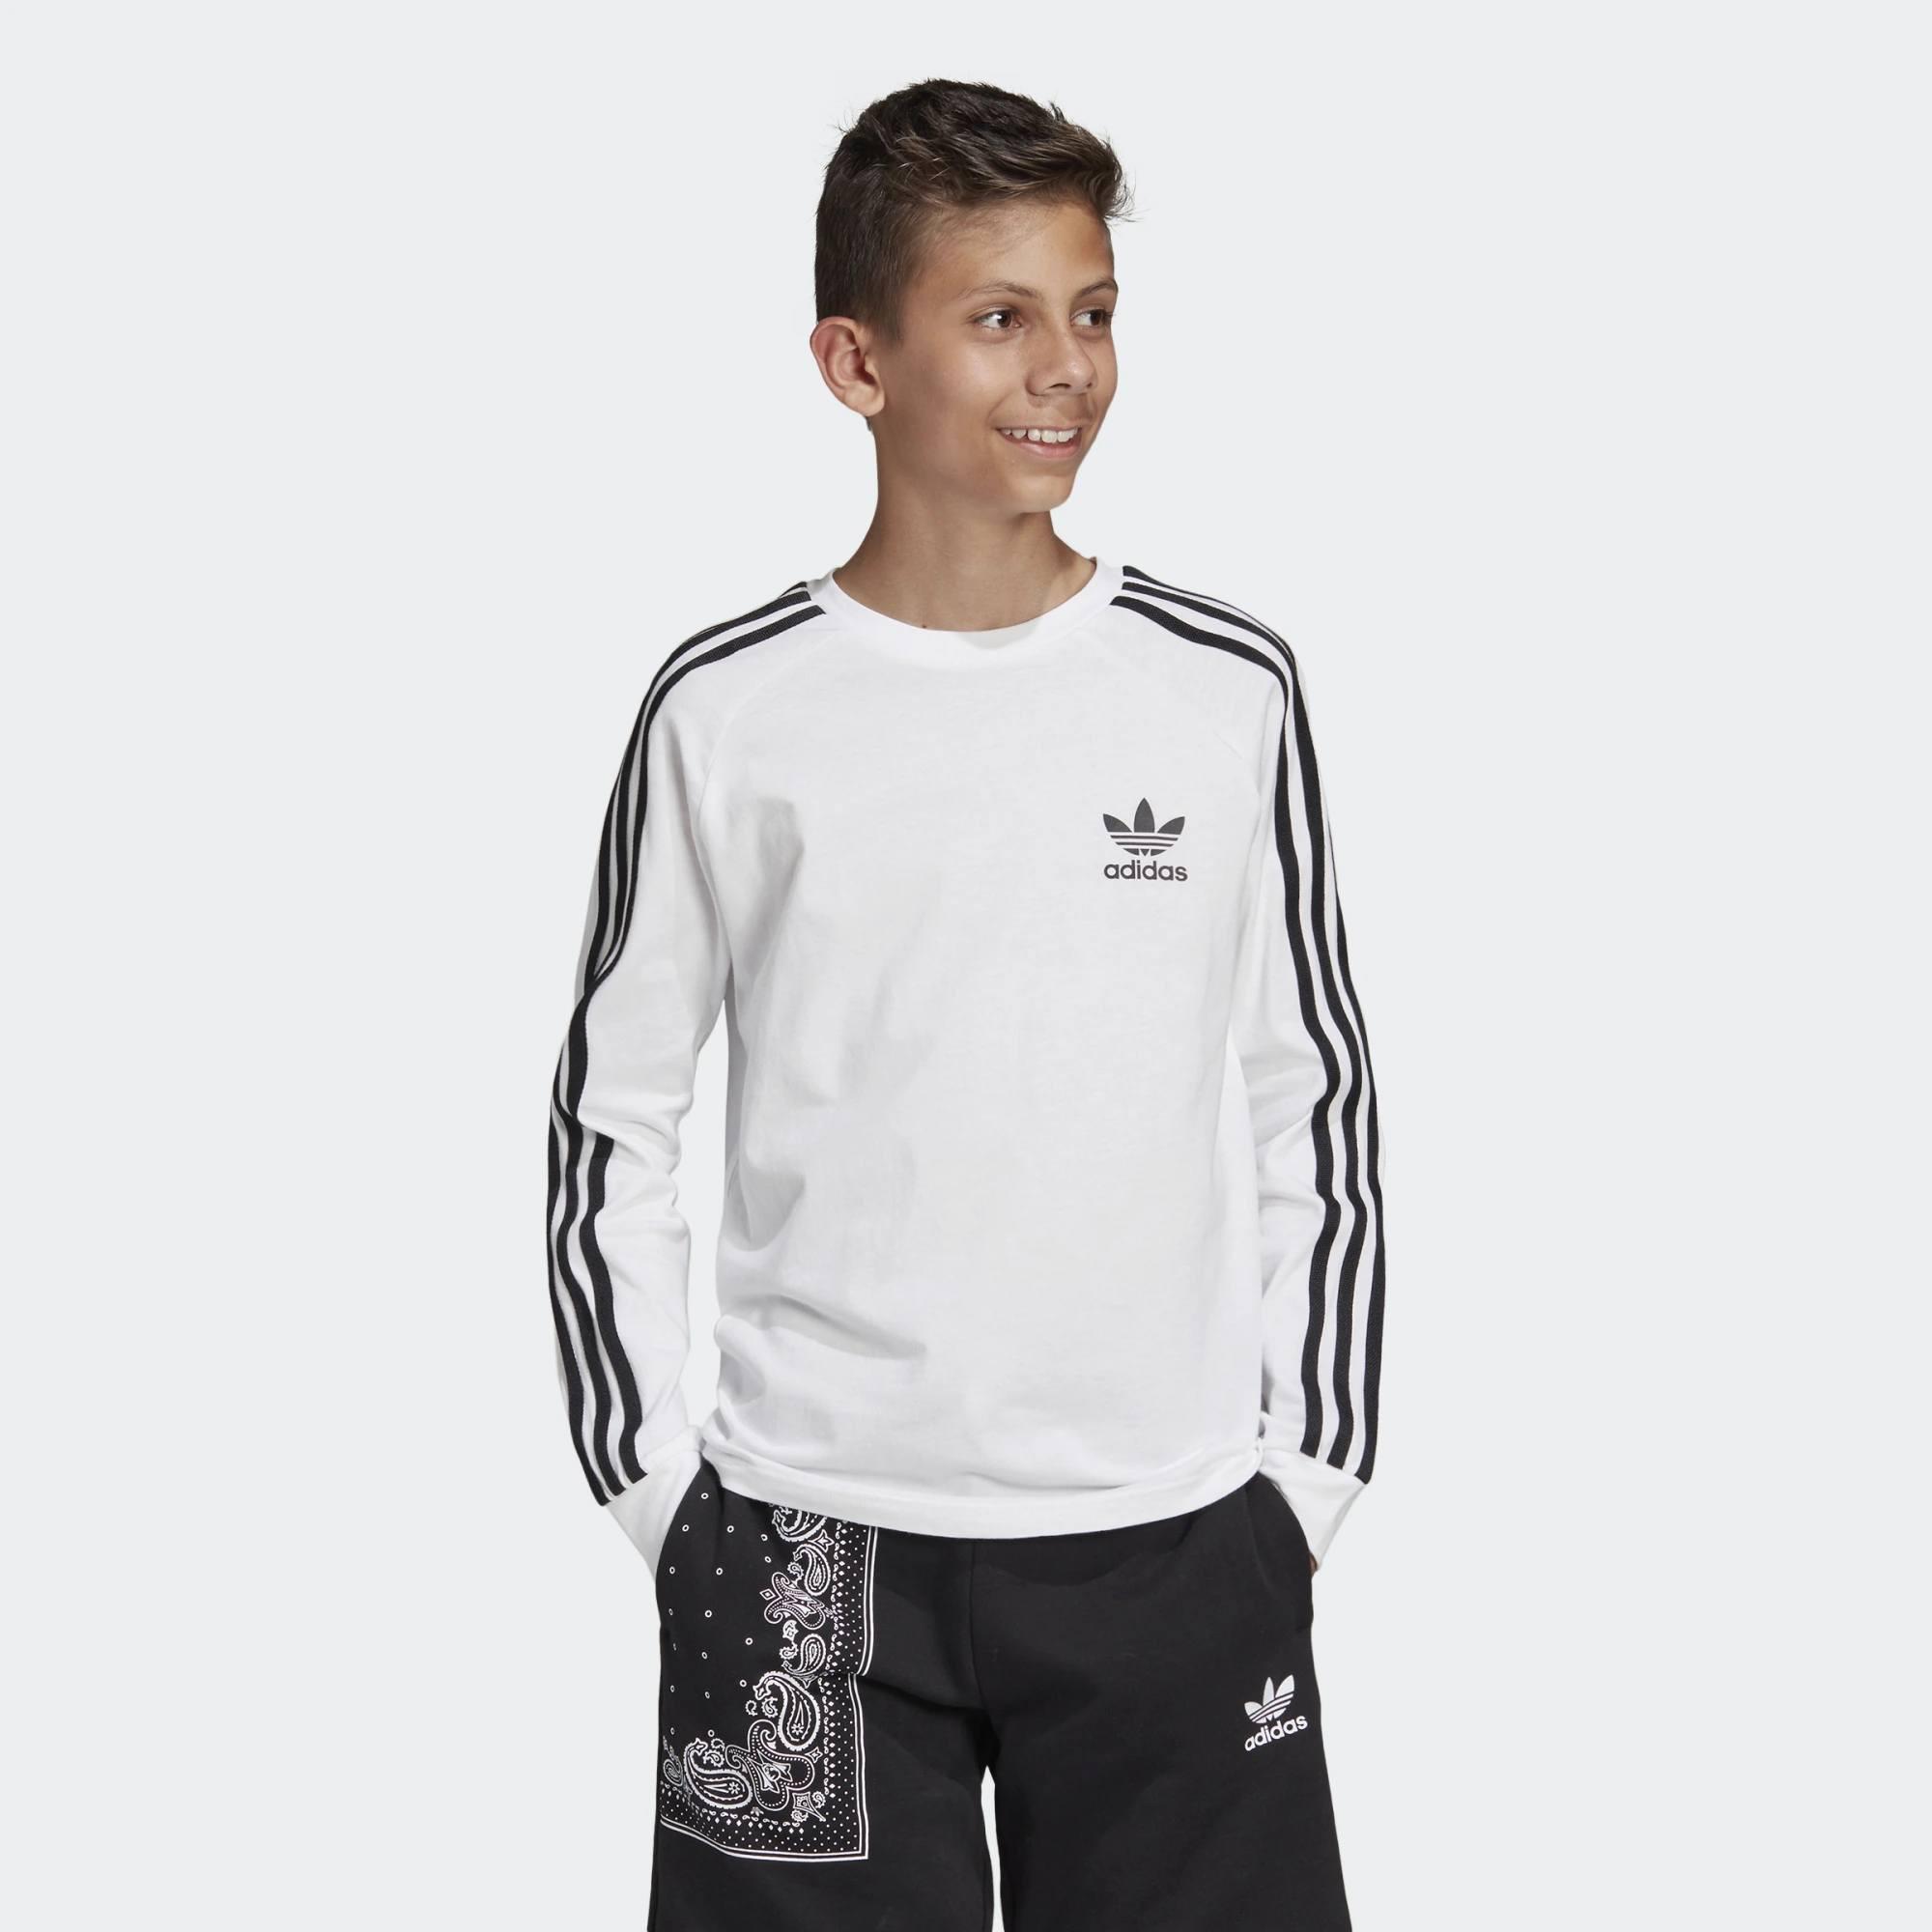 adidas Originals 3-Stripes Long Sleeve Tee (9000031588_1540)